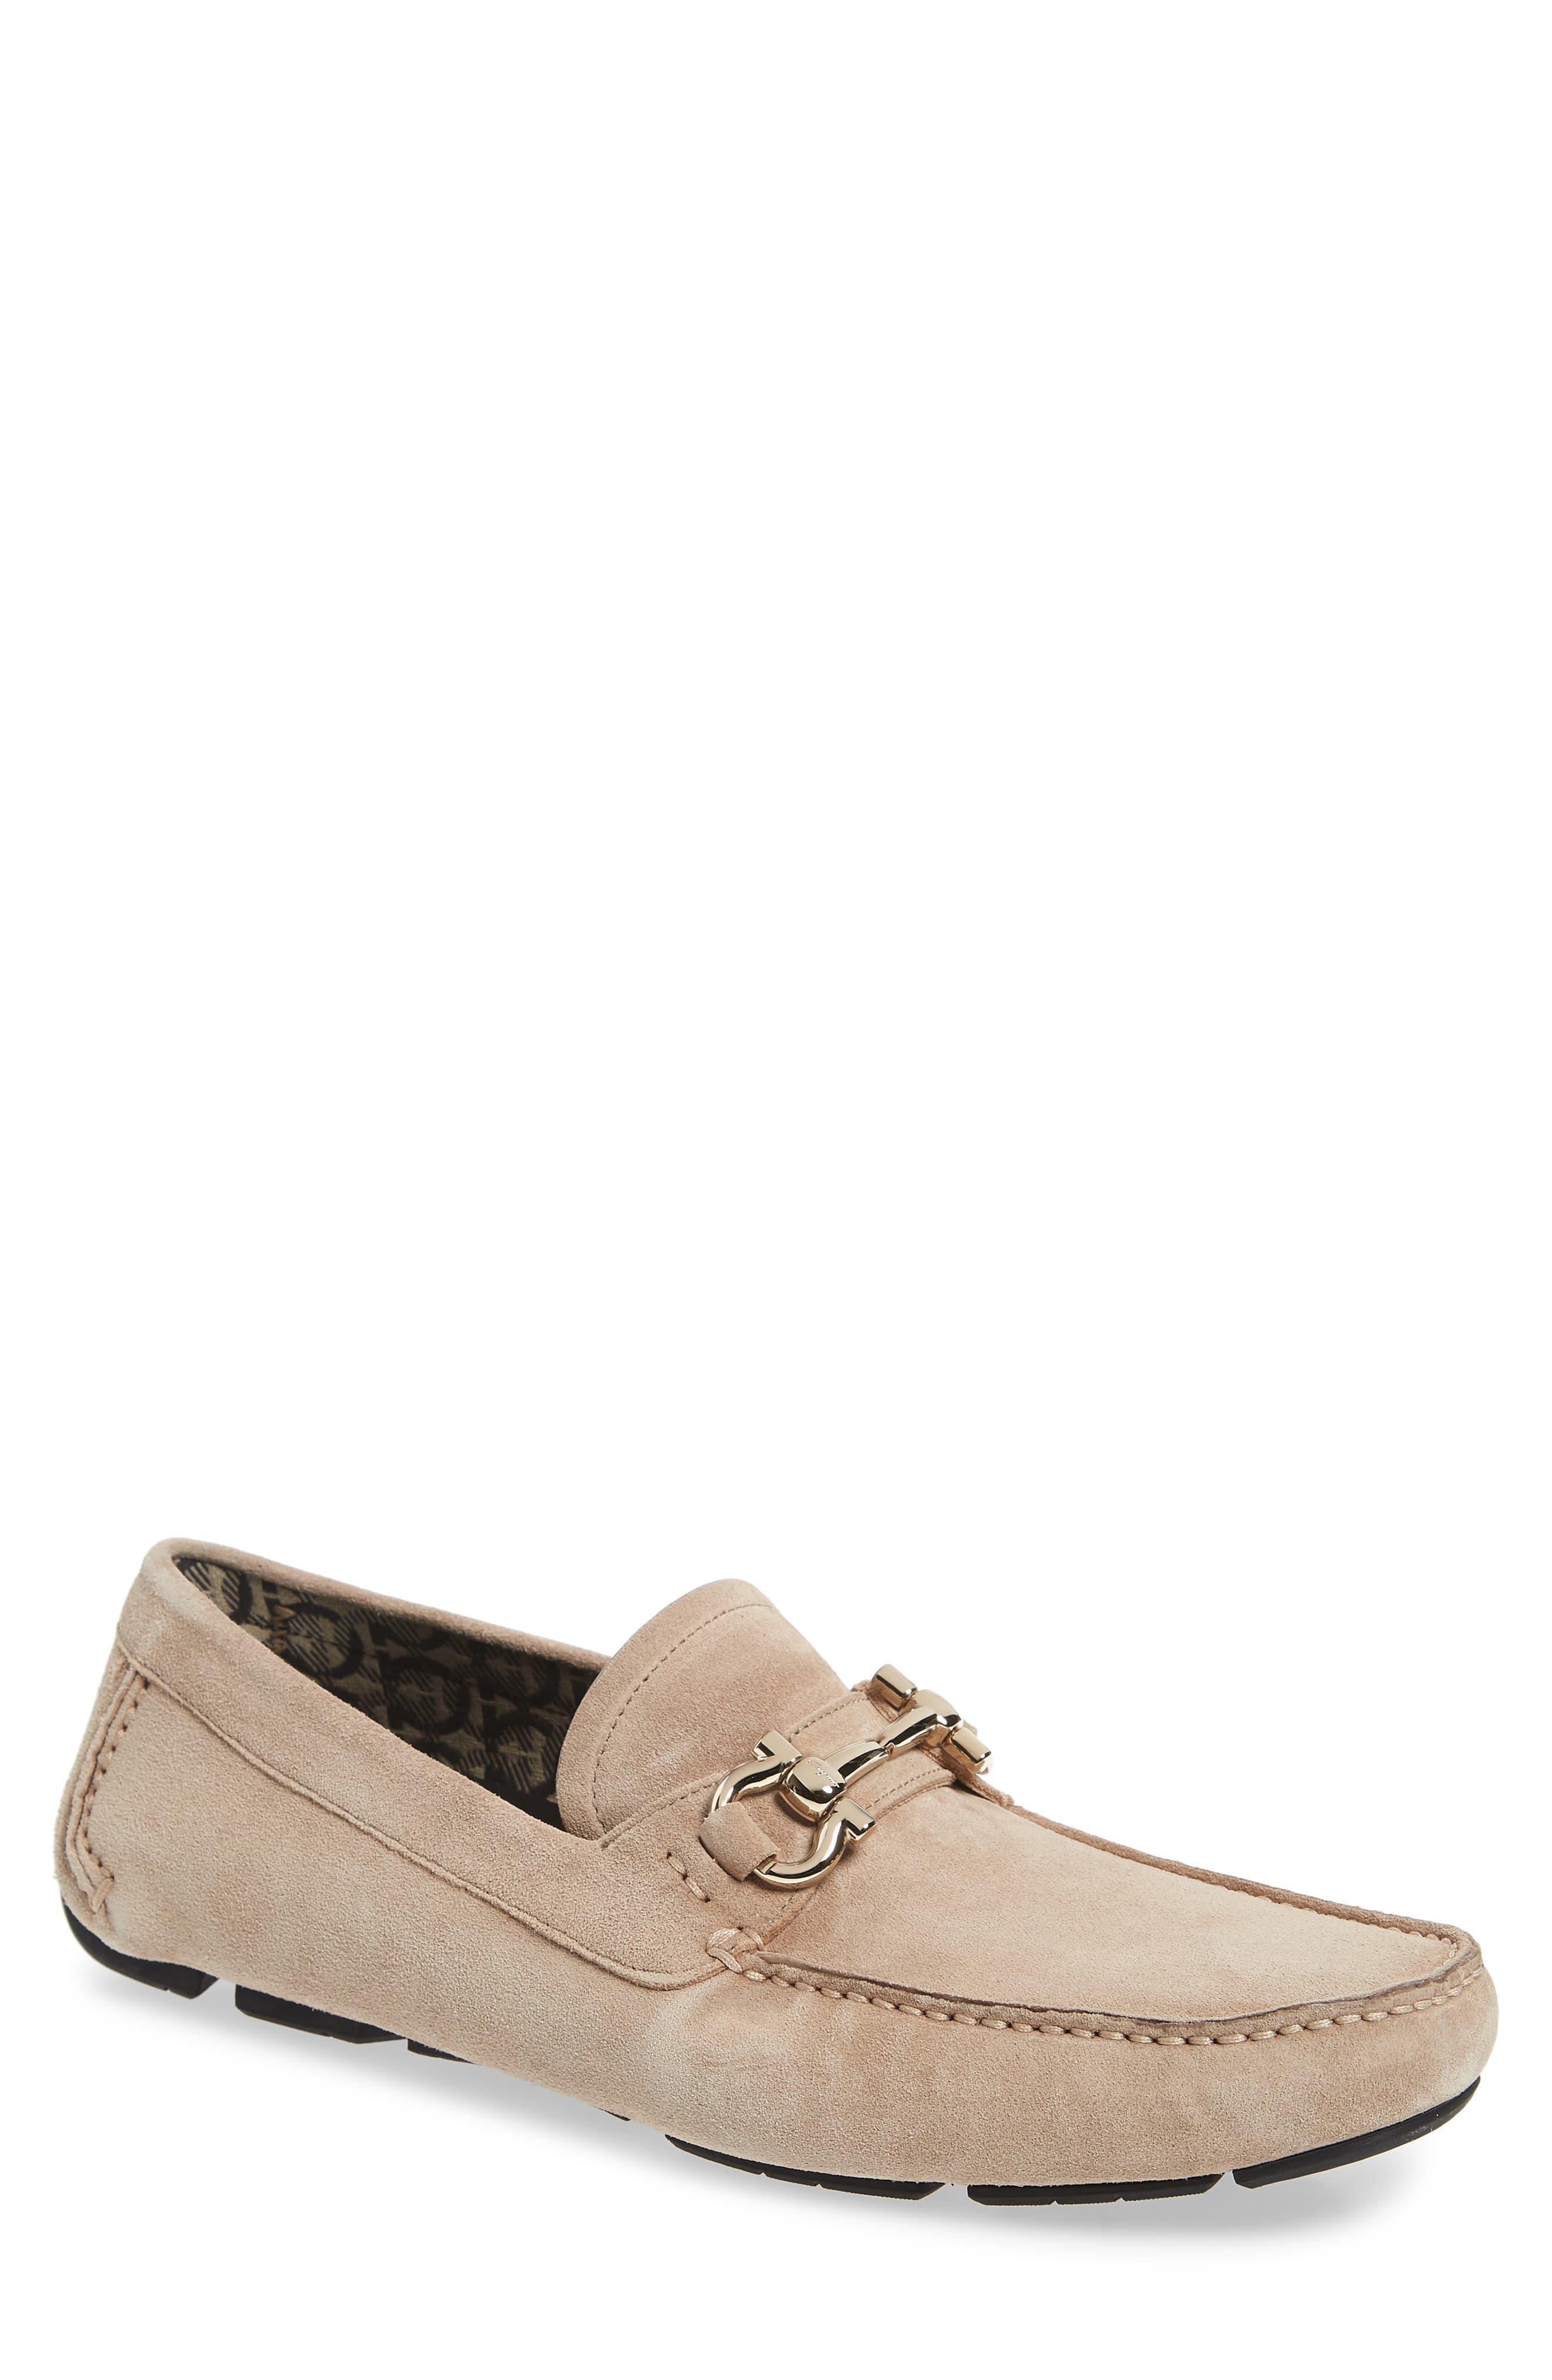 Men's Salvatore Ferragamo Shoes | Nordstrom